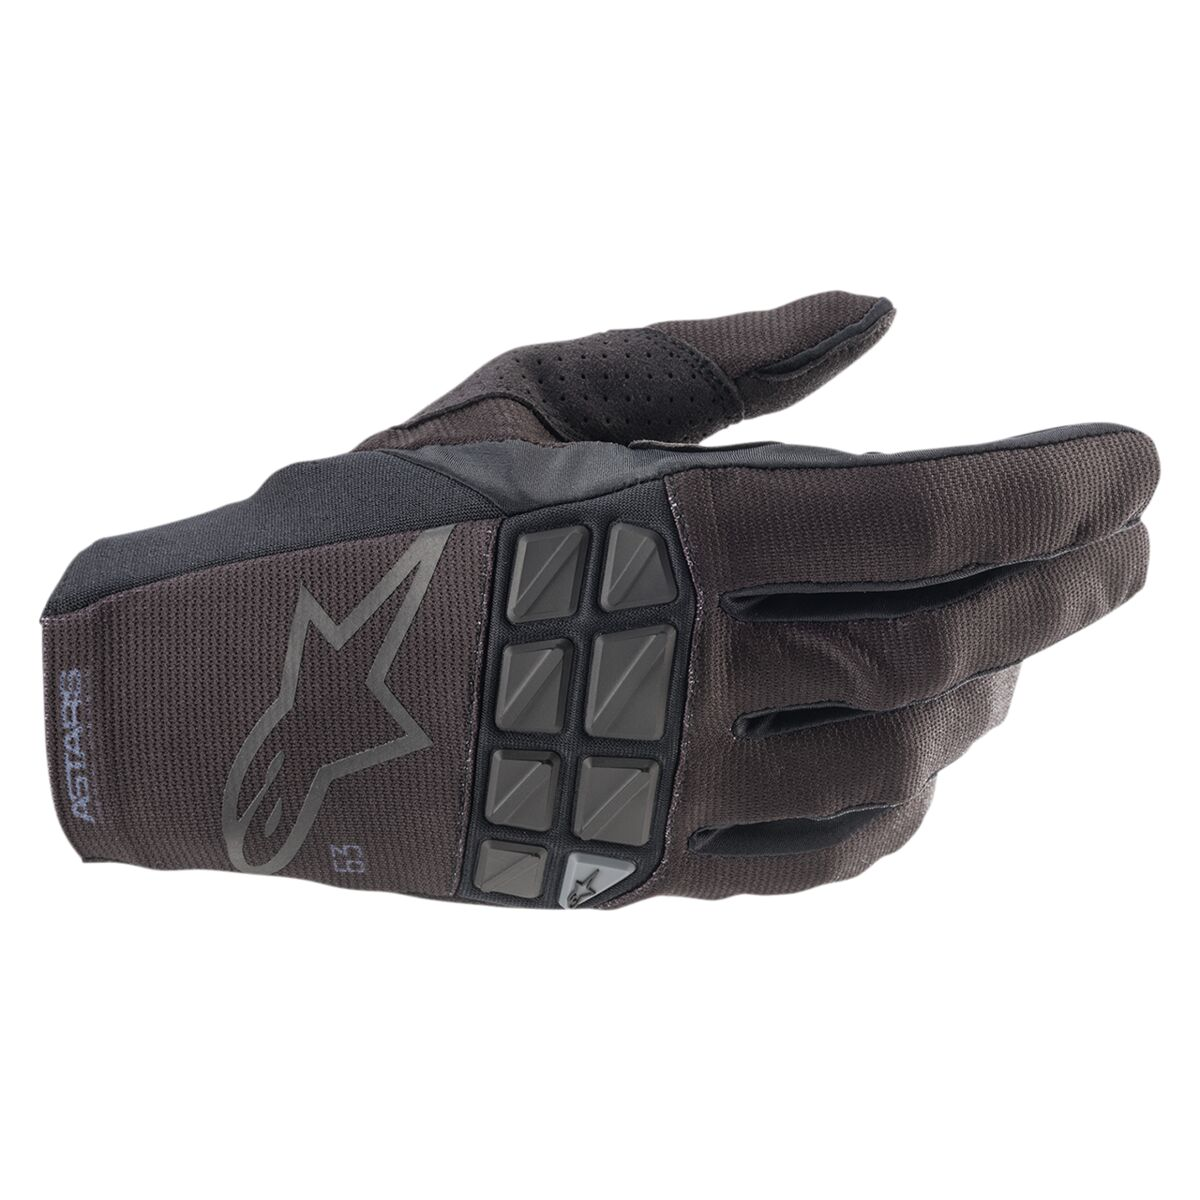 Alpinestars Racefend Men/'s Motorcycle Riding Gloves Grey Black Hi-Viz Large